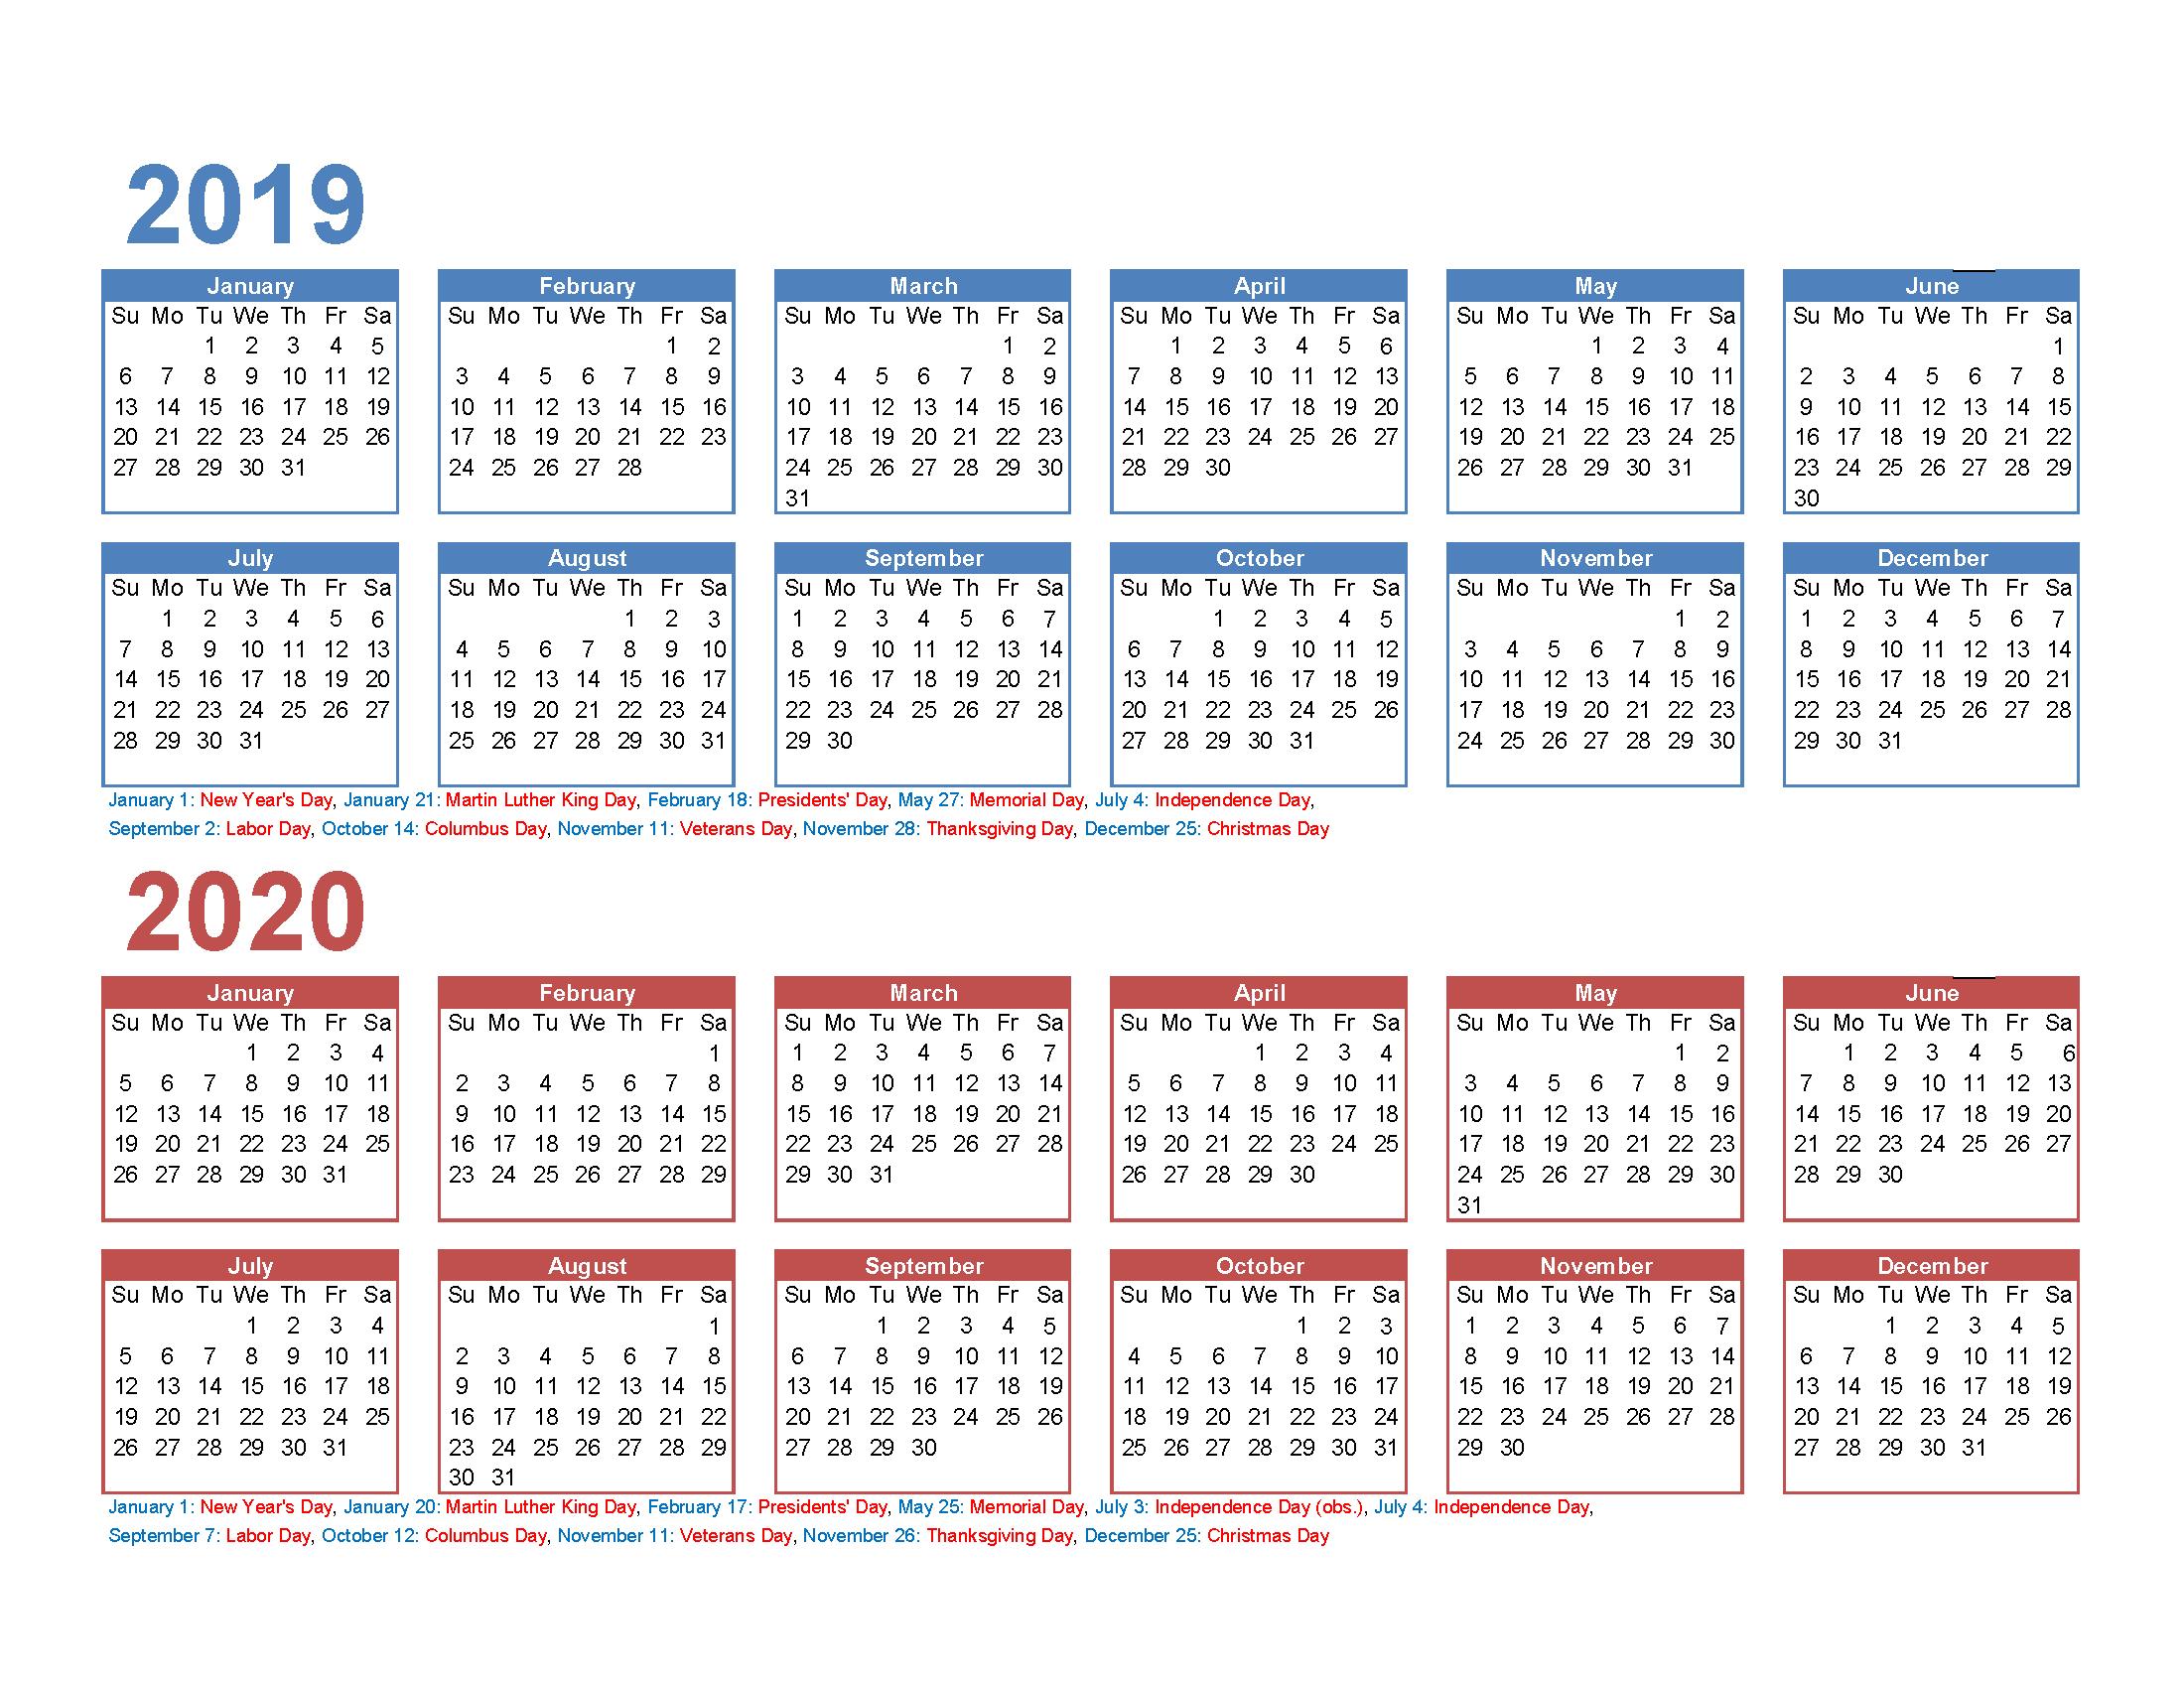 Free 2019 And 2020 Calendar Printable 2 Year Calendar   Free 4 Year Printable Calendar